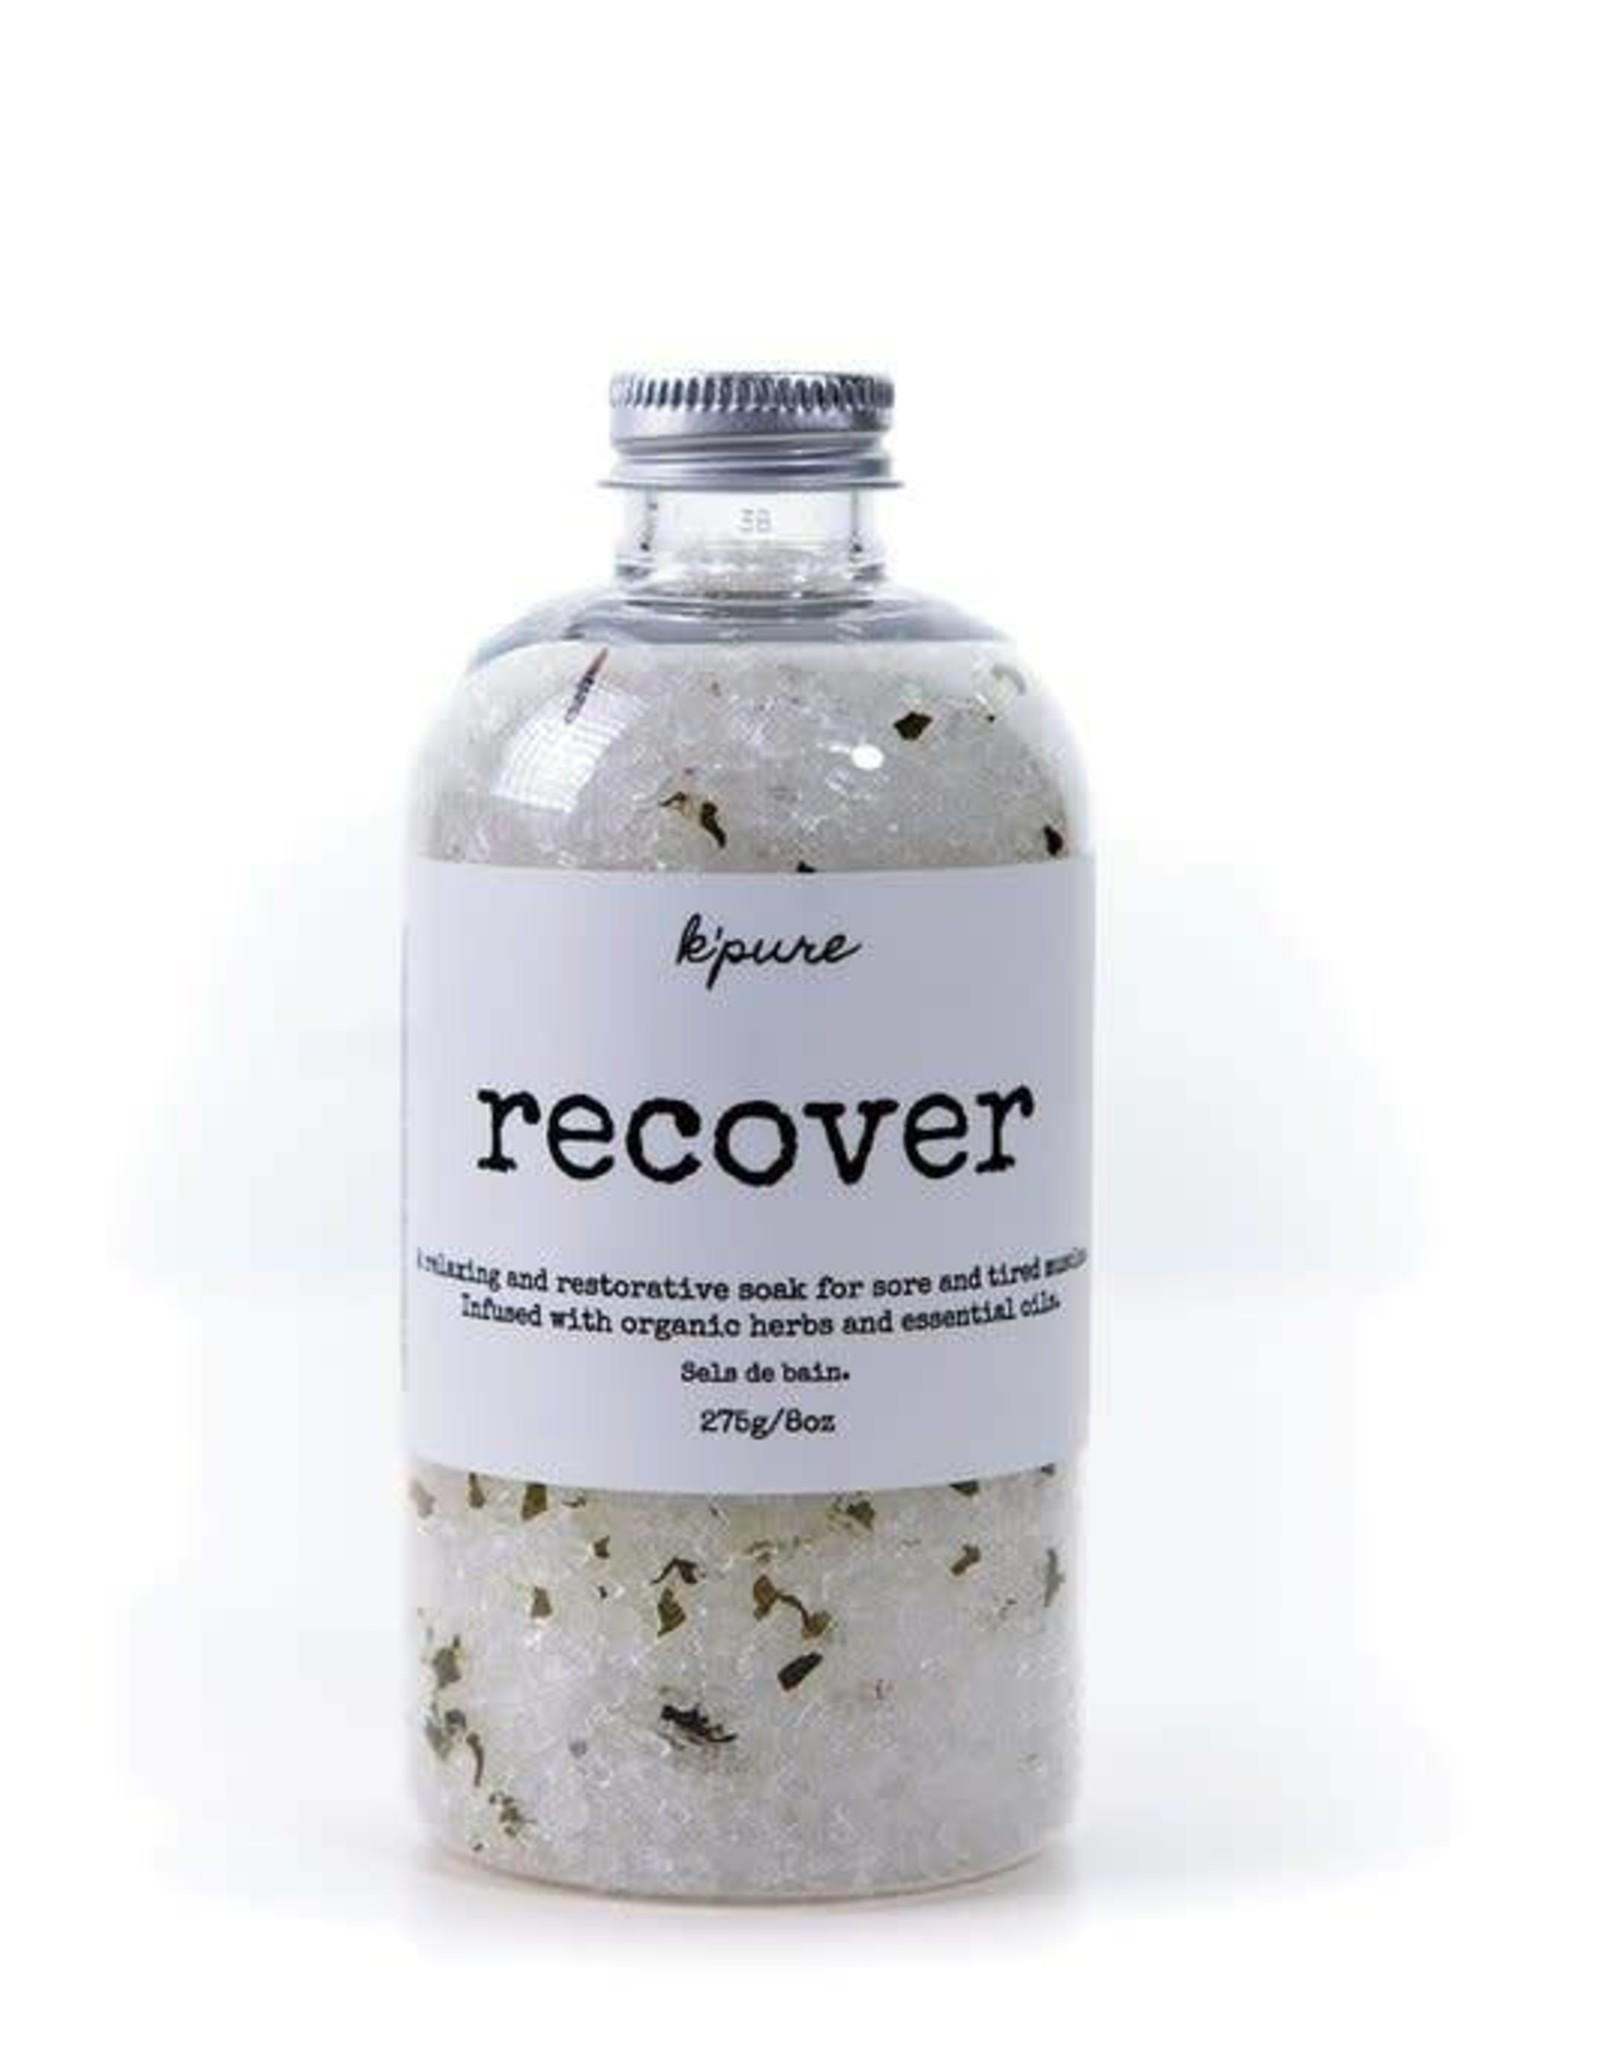 K'PURE RECOVER bath salt, 8oz